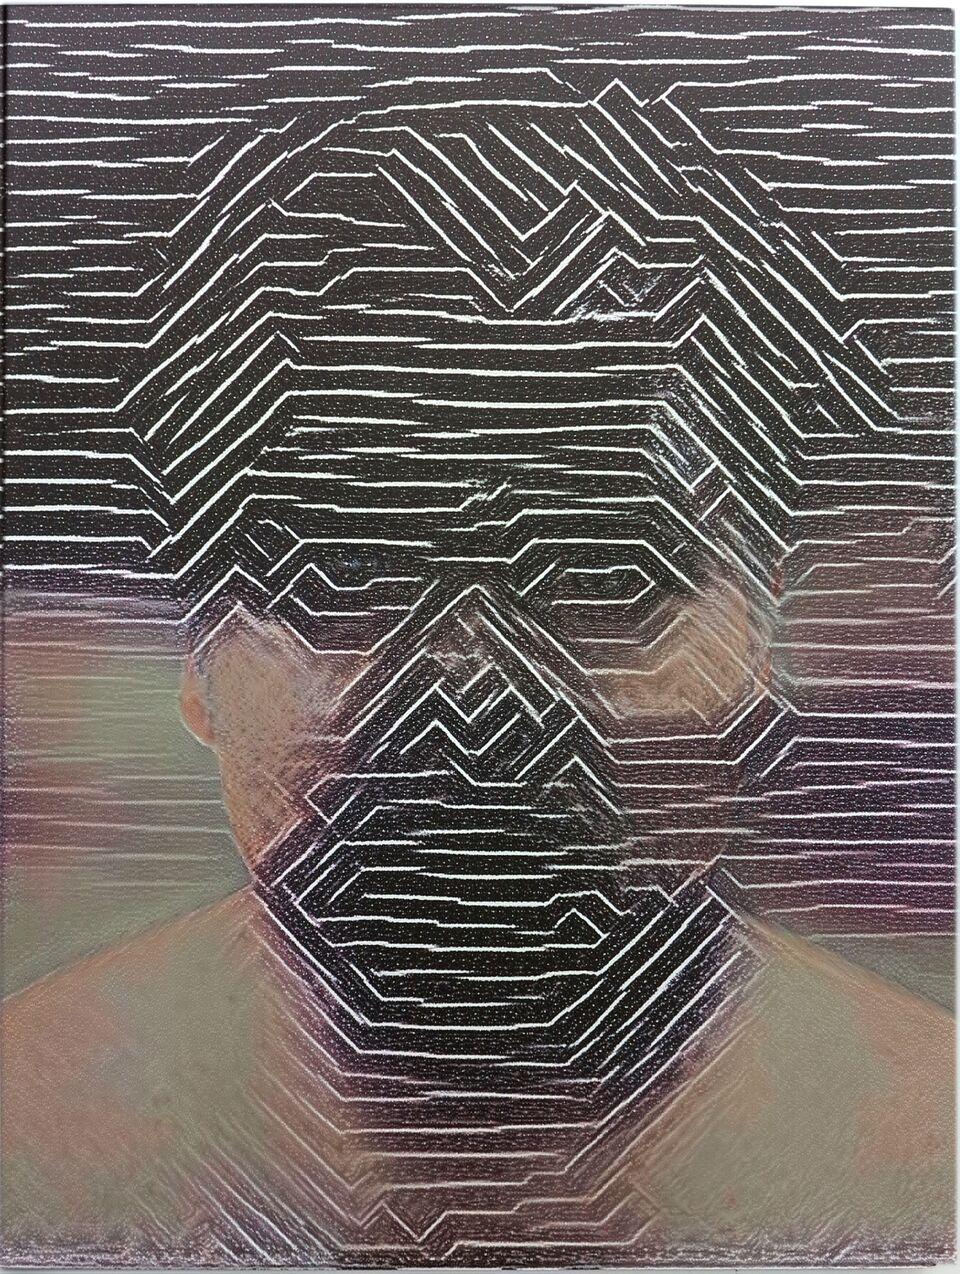 Artificial Intelligence Style Transfer Self-Portrait (Frank Stella & My Face)